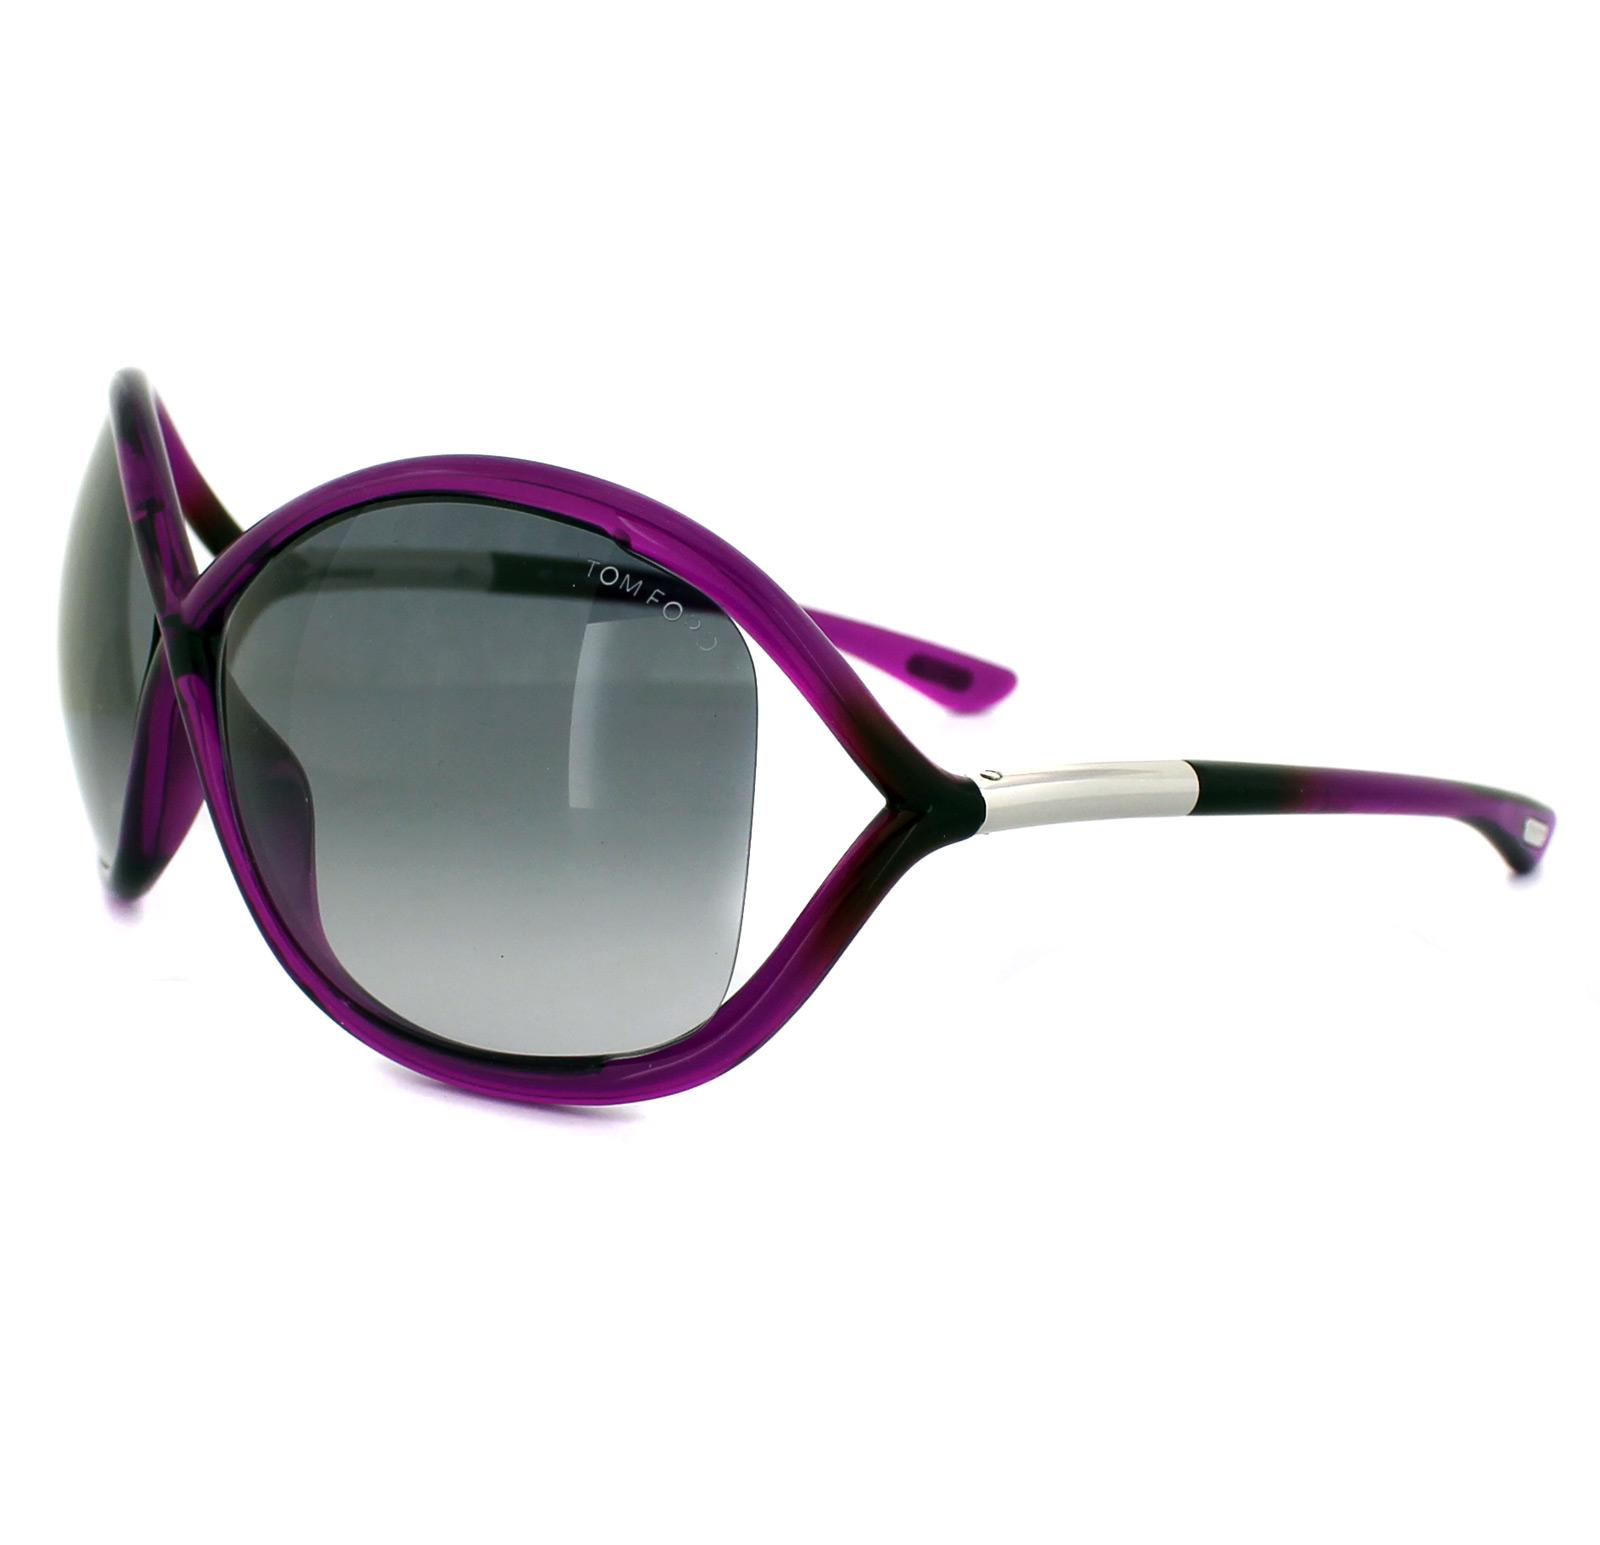 tom ford sonnenbrille modell 39 whitney 39 pink neu ebay. Black Bedroom Furniture Sets. Home Design Ideas